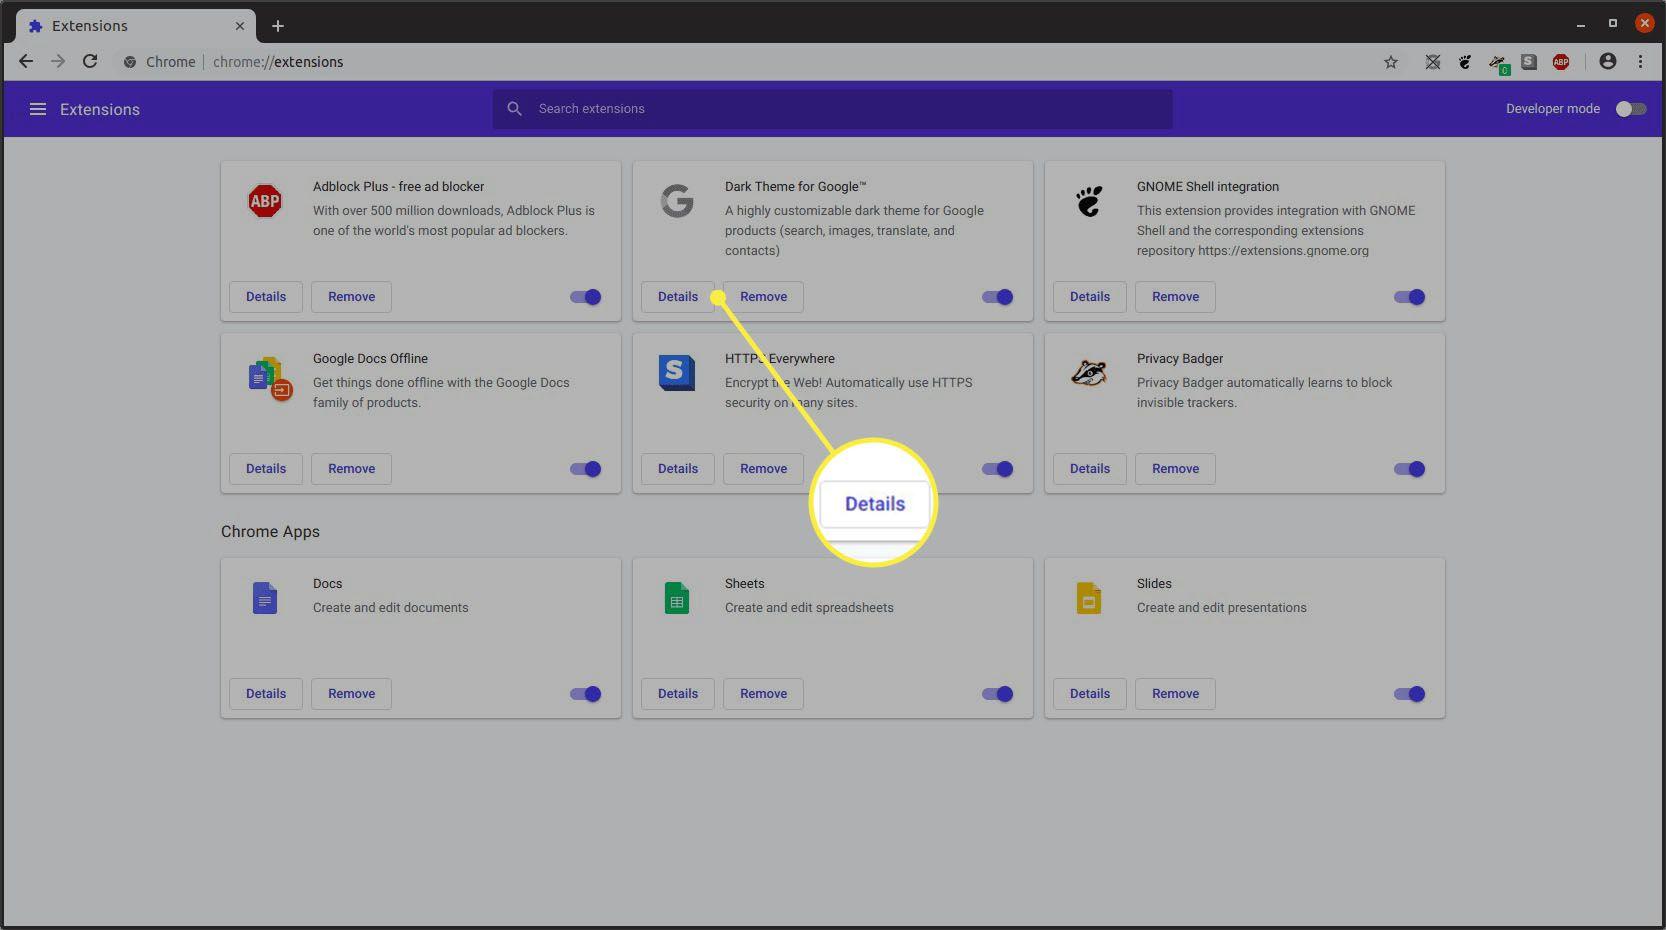 Google Chrome extensions menu page